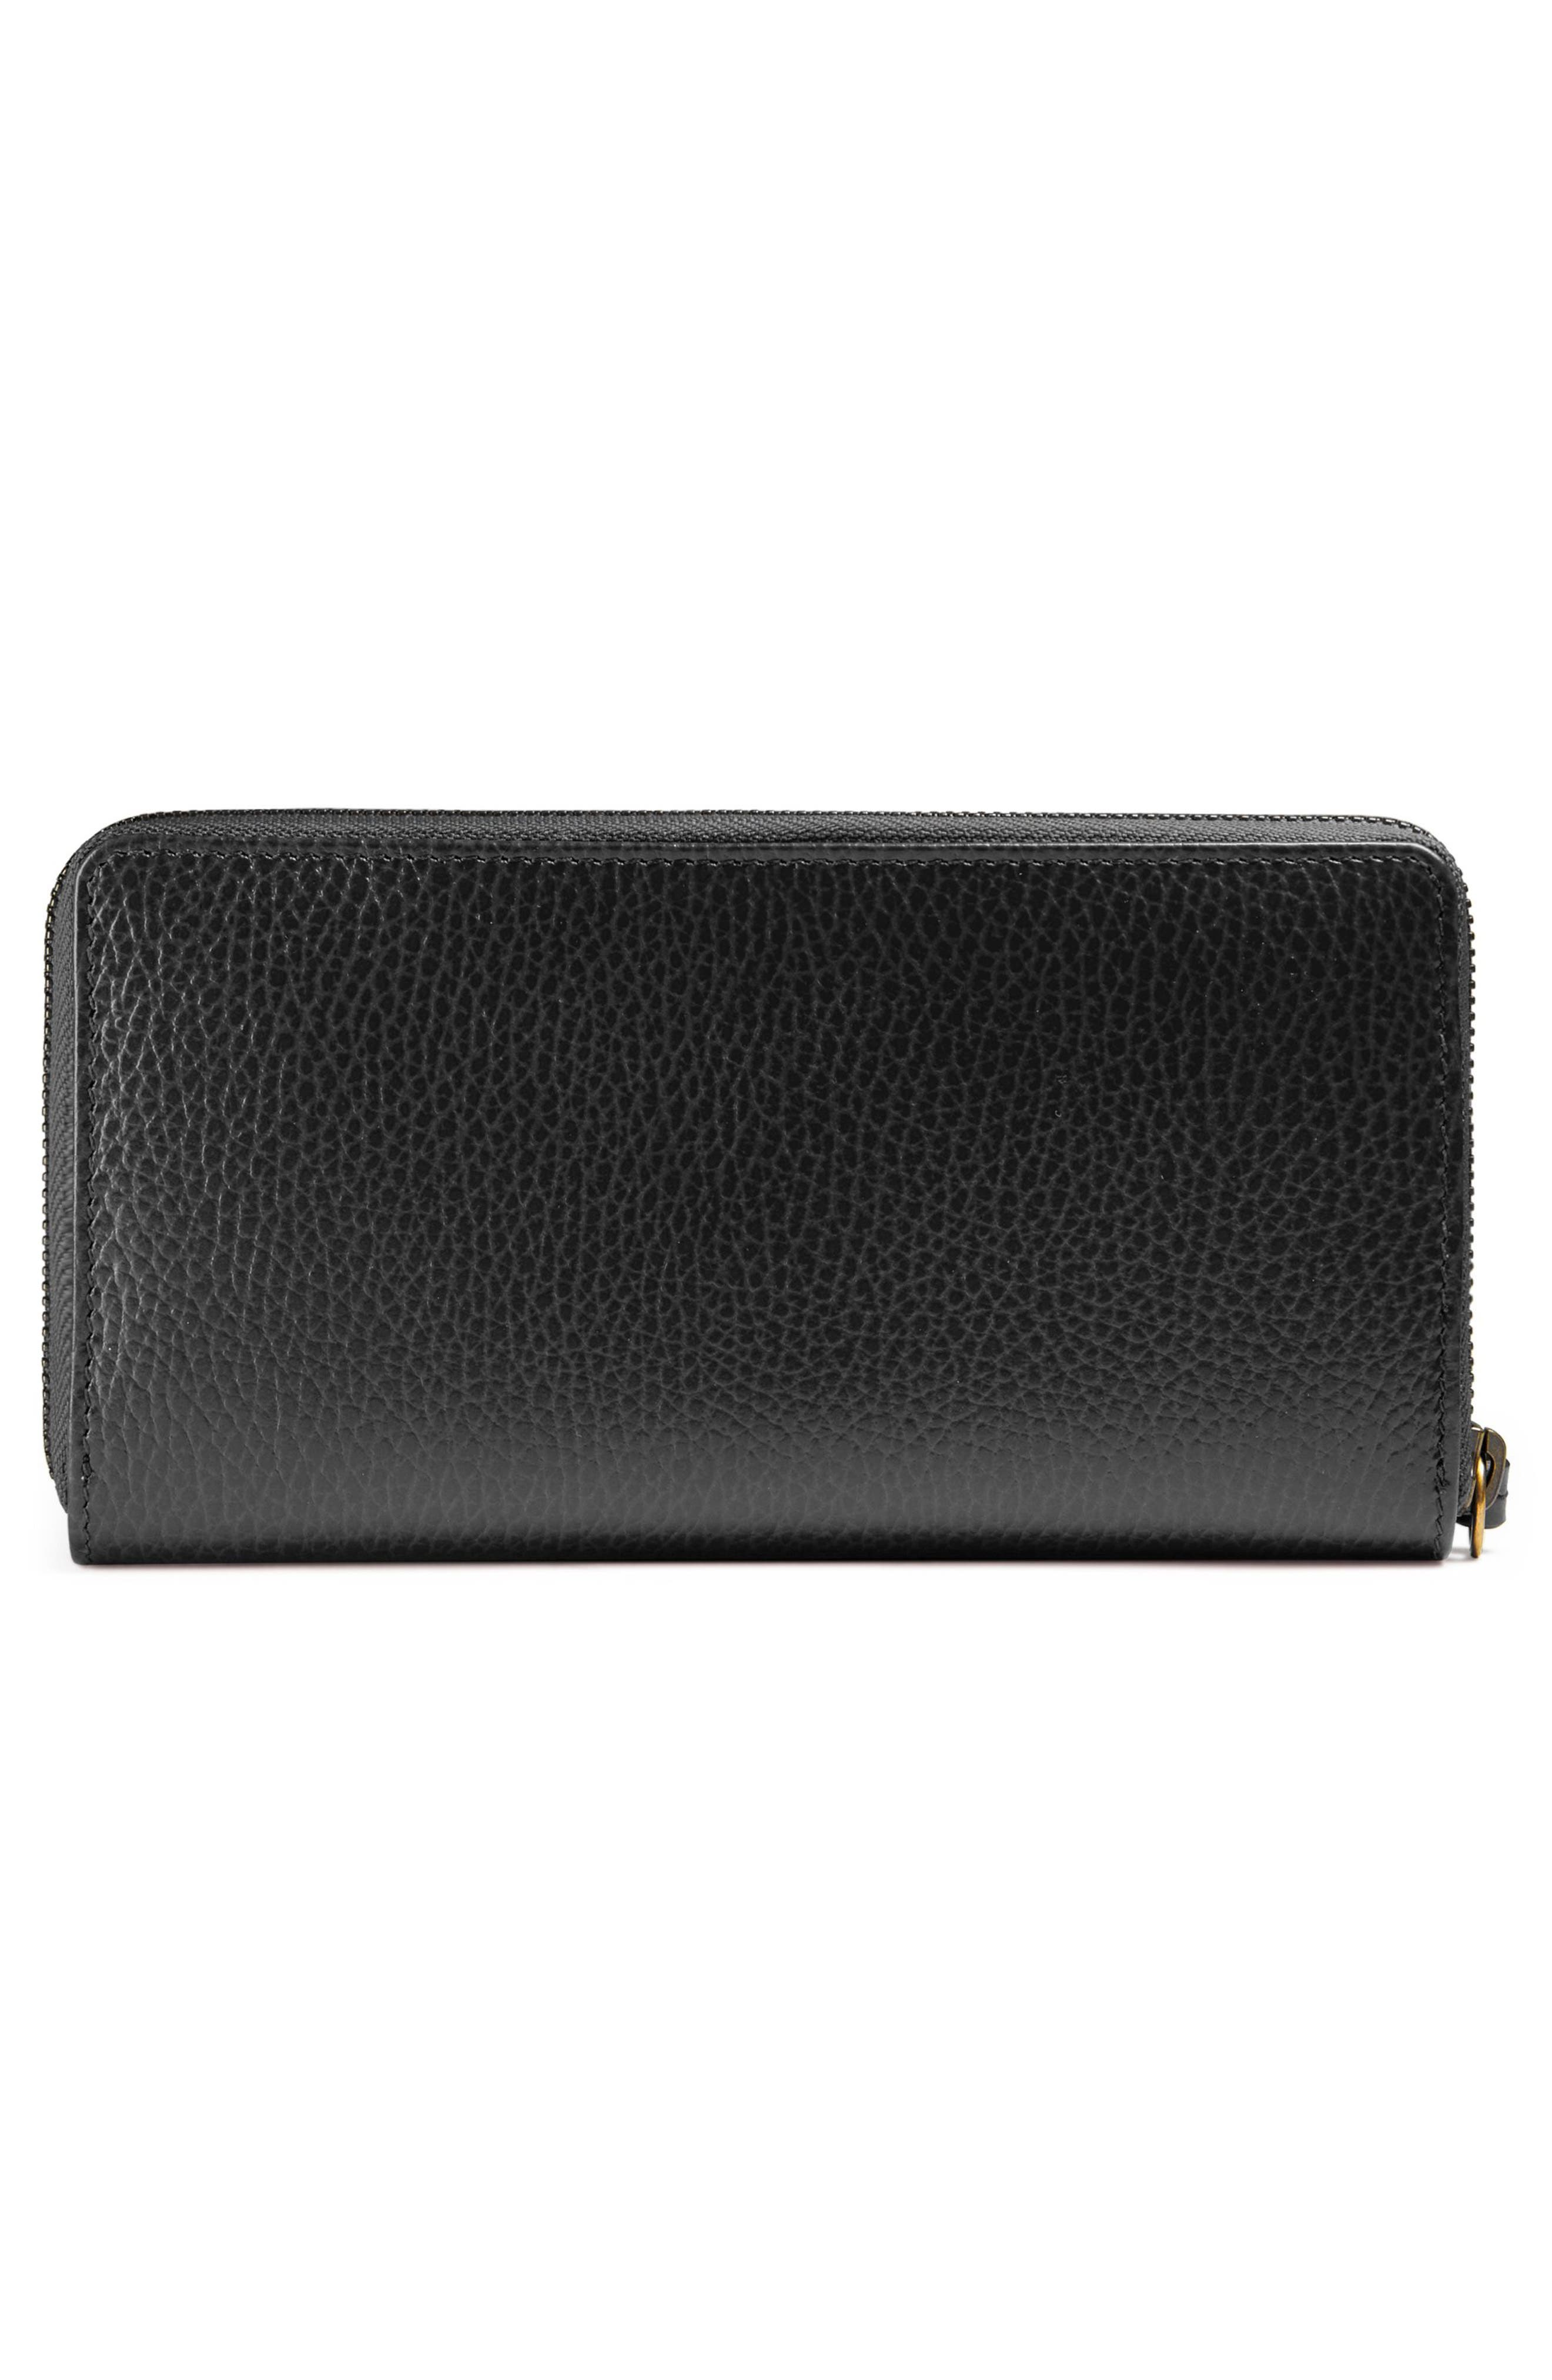 GUCCI, Farfalla Zip Around Leather Wallet, Alternate thumbnail 3, color, NERO/ CRYSTAL